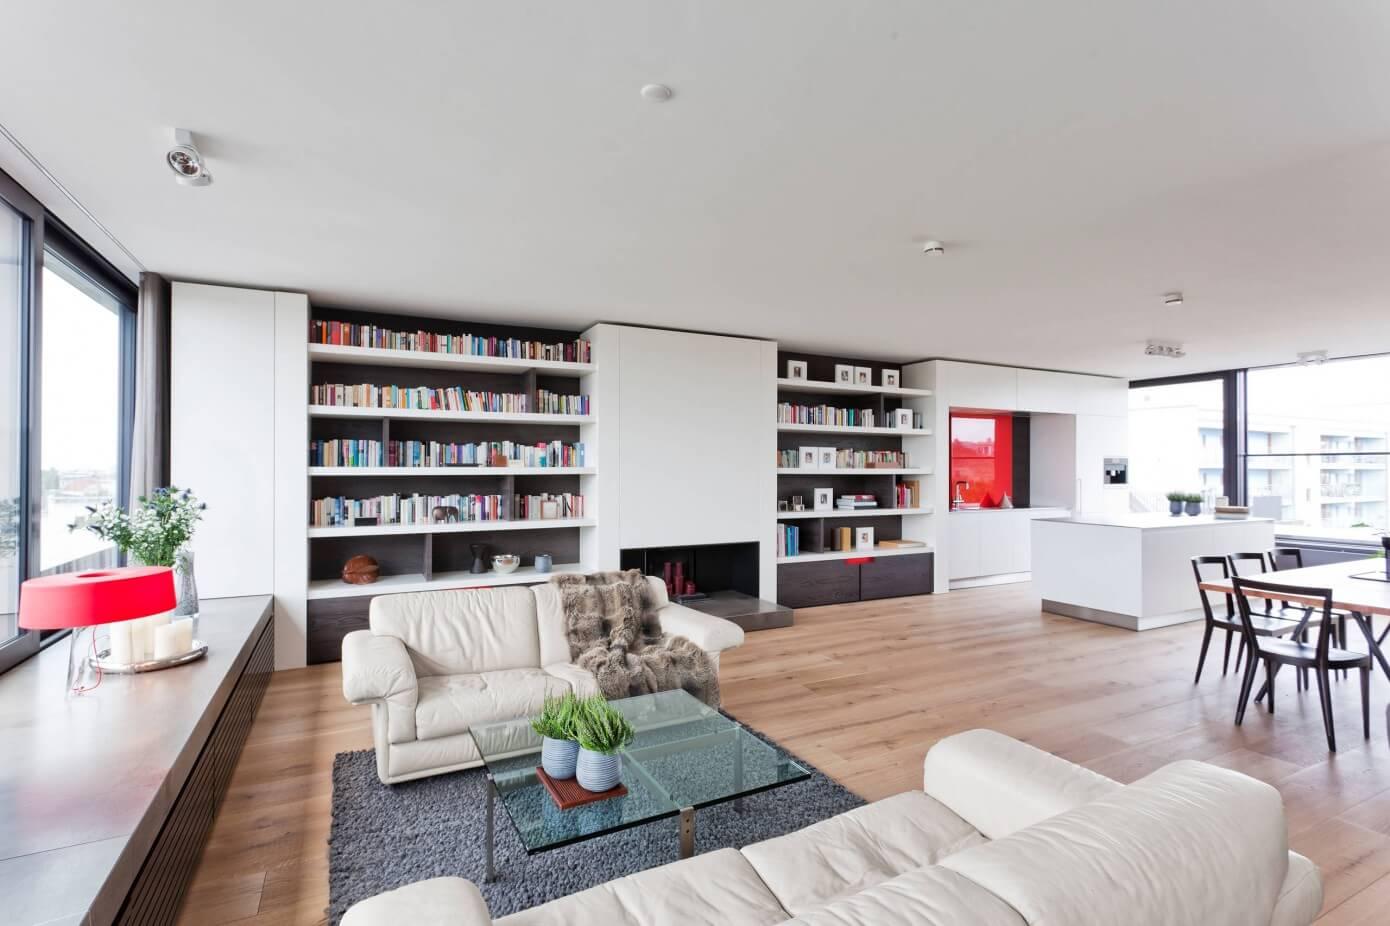 009 penthouse berlin hansenwinkler homeadore. Black Bedroom Furniture Sets. Home Design Ideas